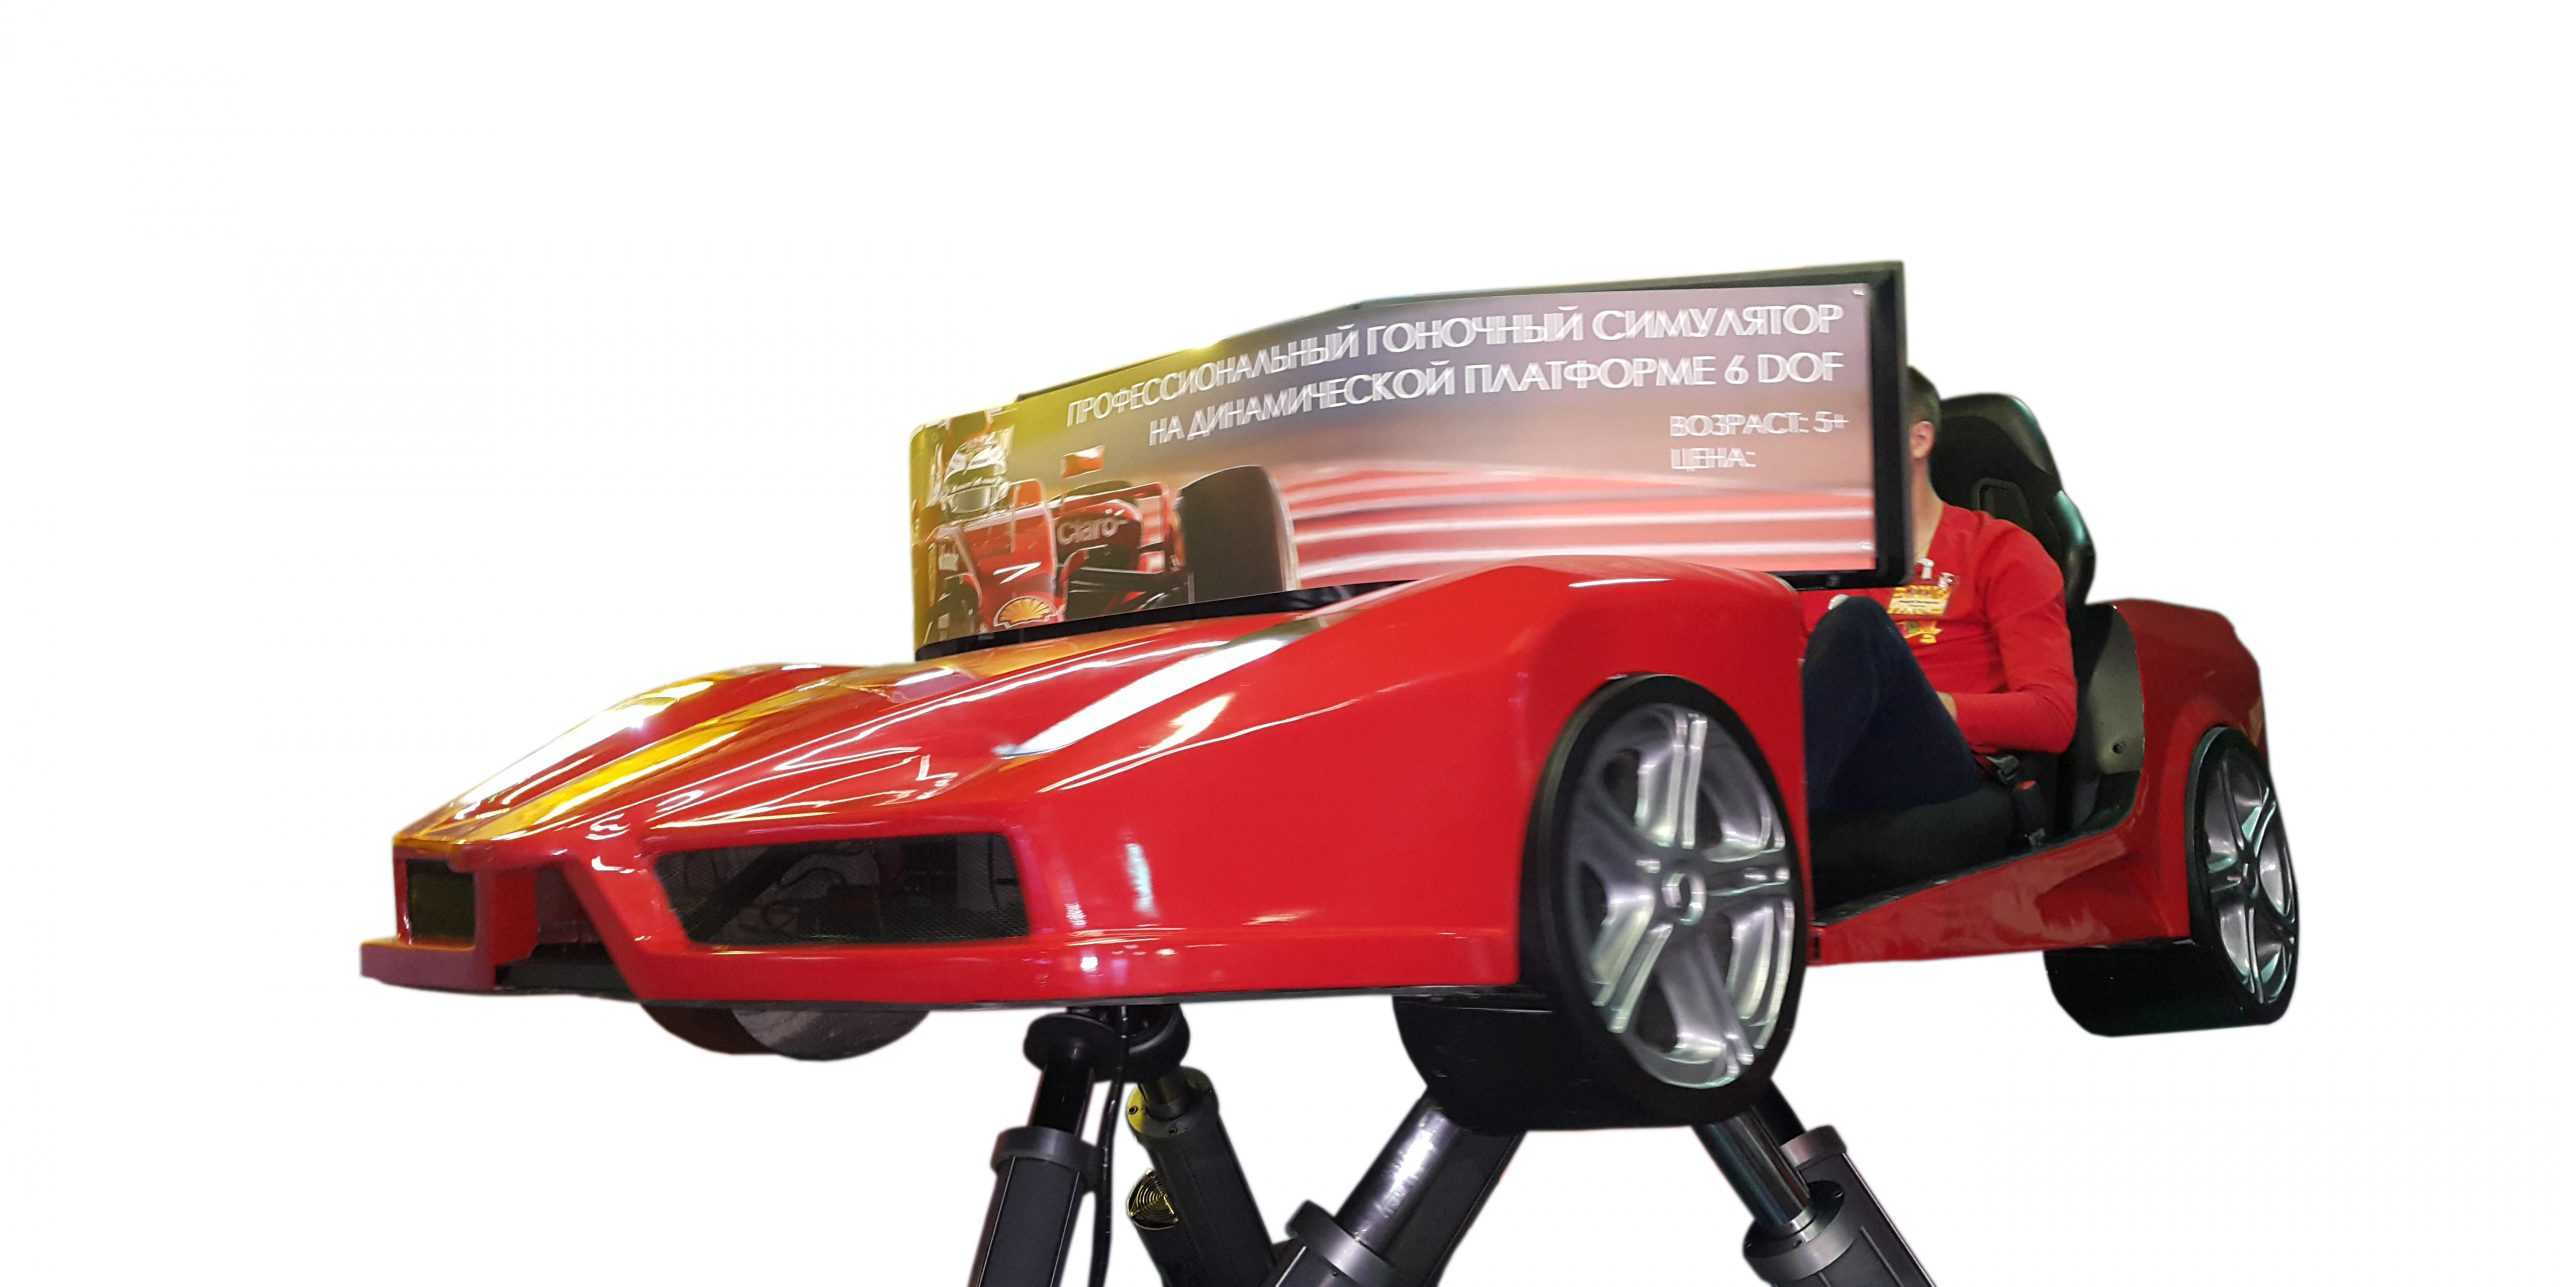 Ferrari_2 Full motion racing simulator 2dof, 3dof,4dof,6dof motion platform